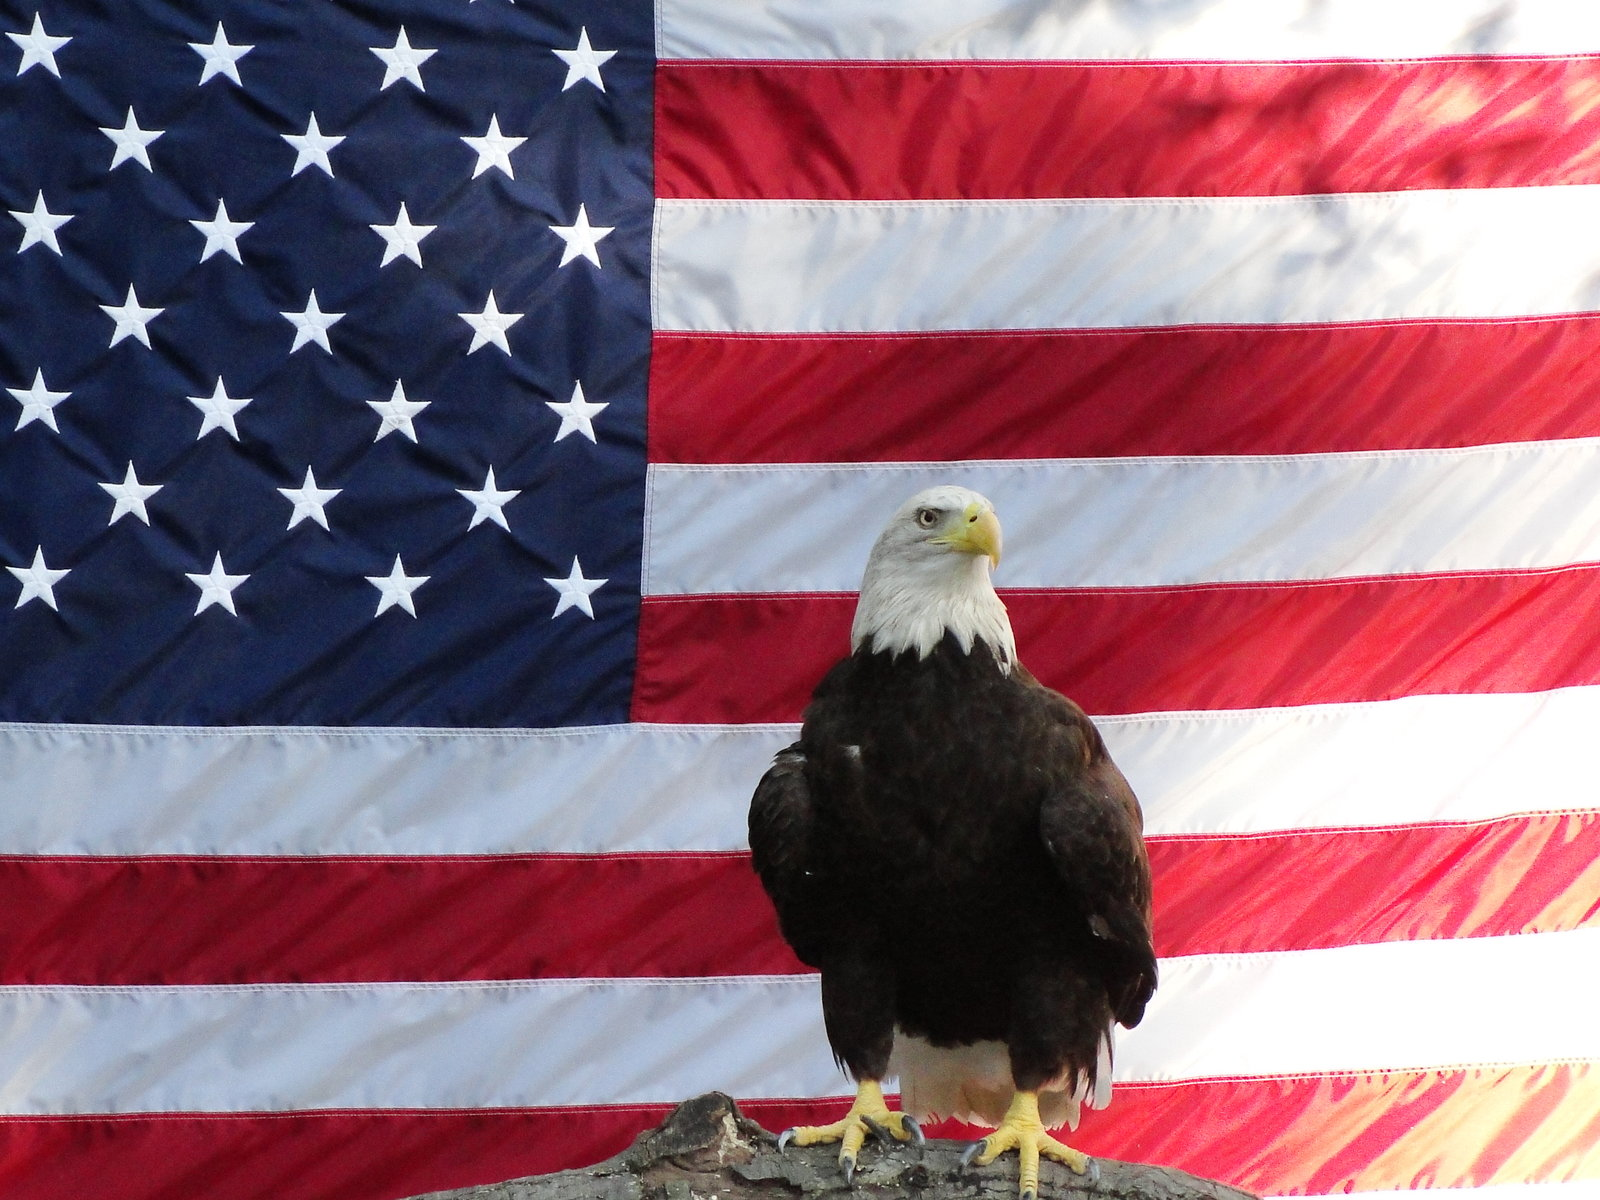 Patriotic Wallpaper Usa Flag Eagle: Eagle And Flag Wallpaper